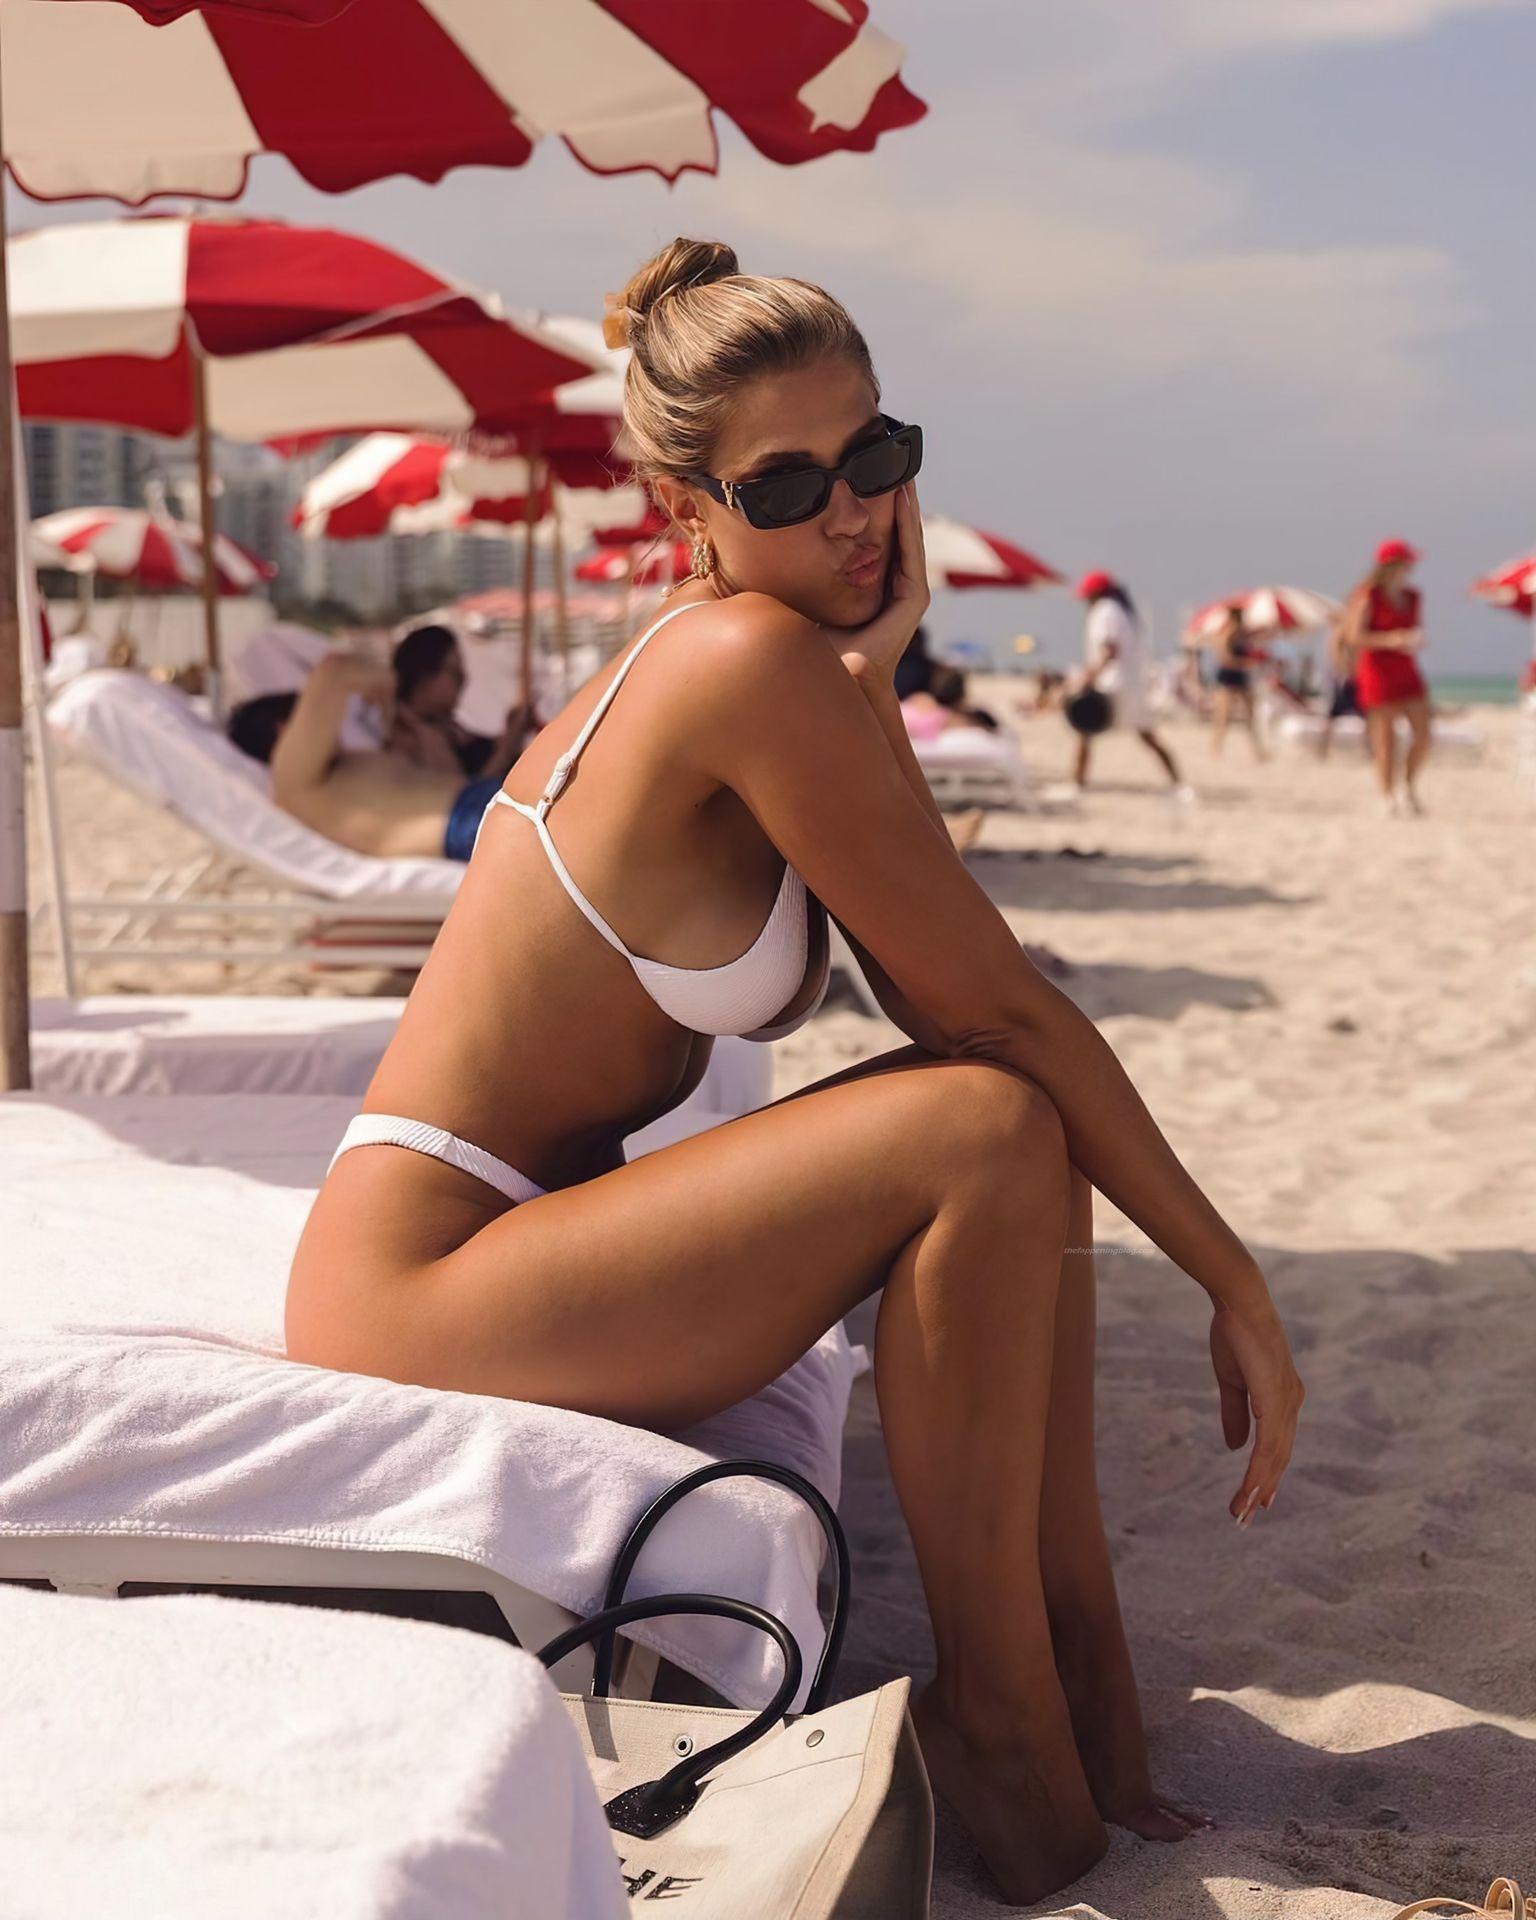 Kara-Del-Toro-Boobs-in-Bikini-3-thefappeningblog.com_.jpg